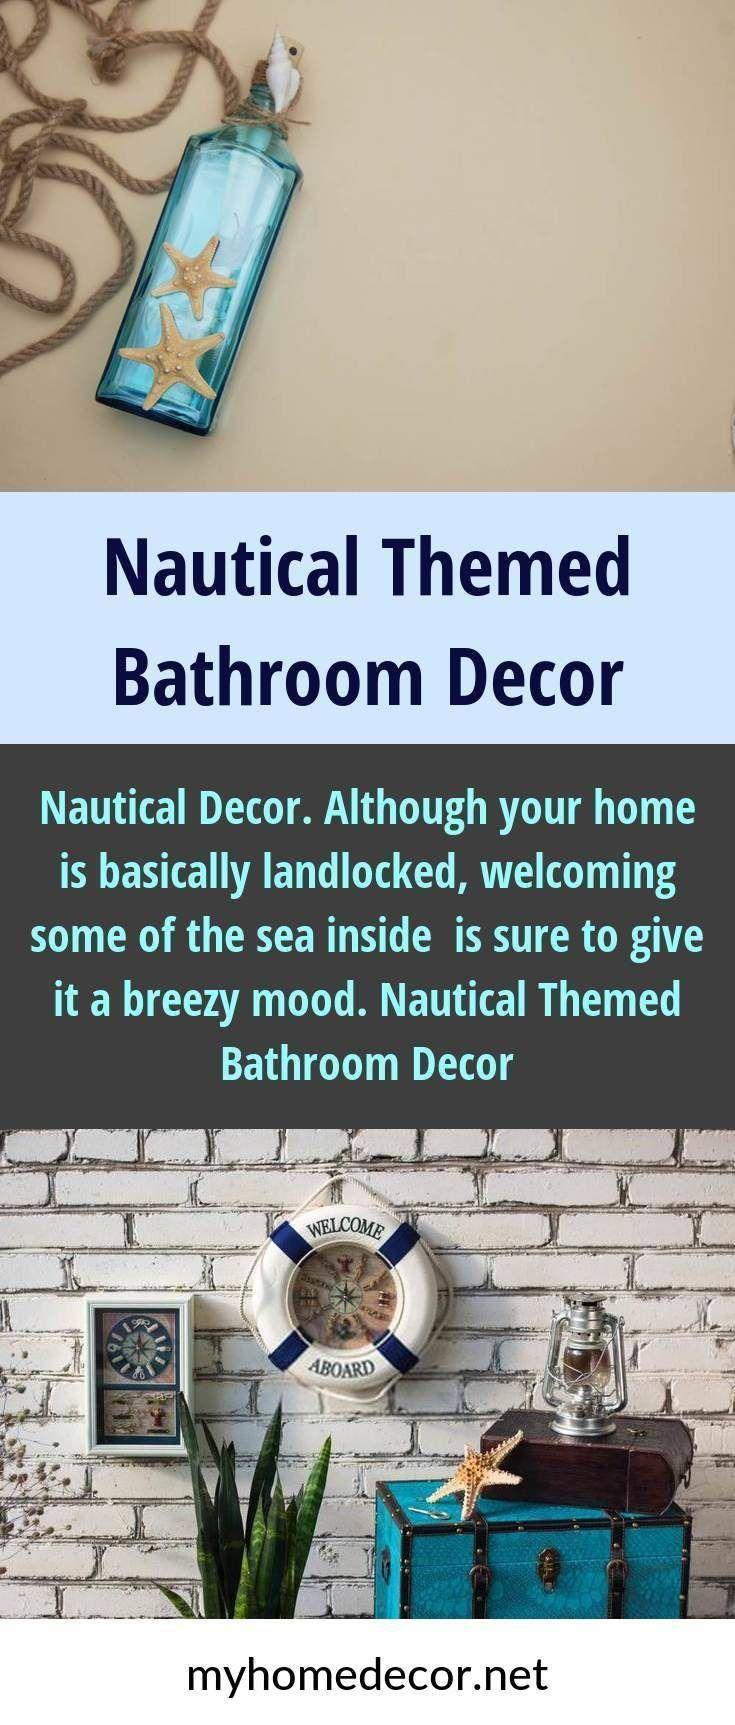 Nautical Decor Although your home is basically landlocked